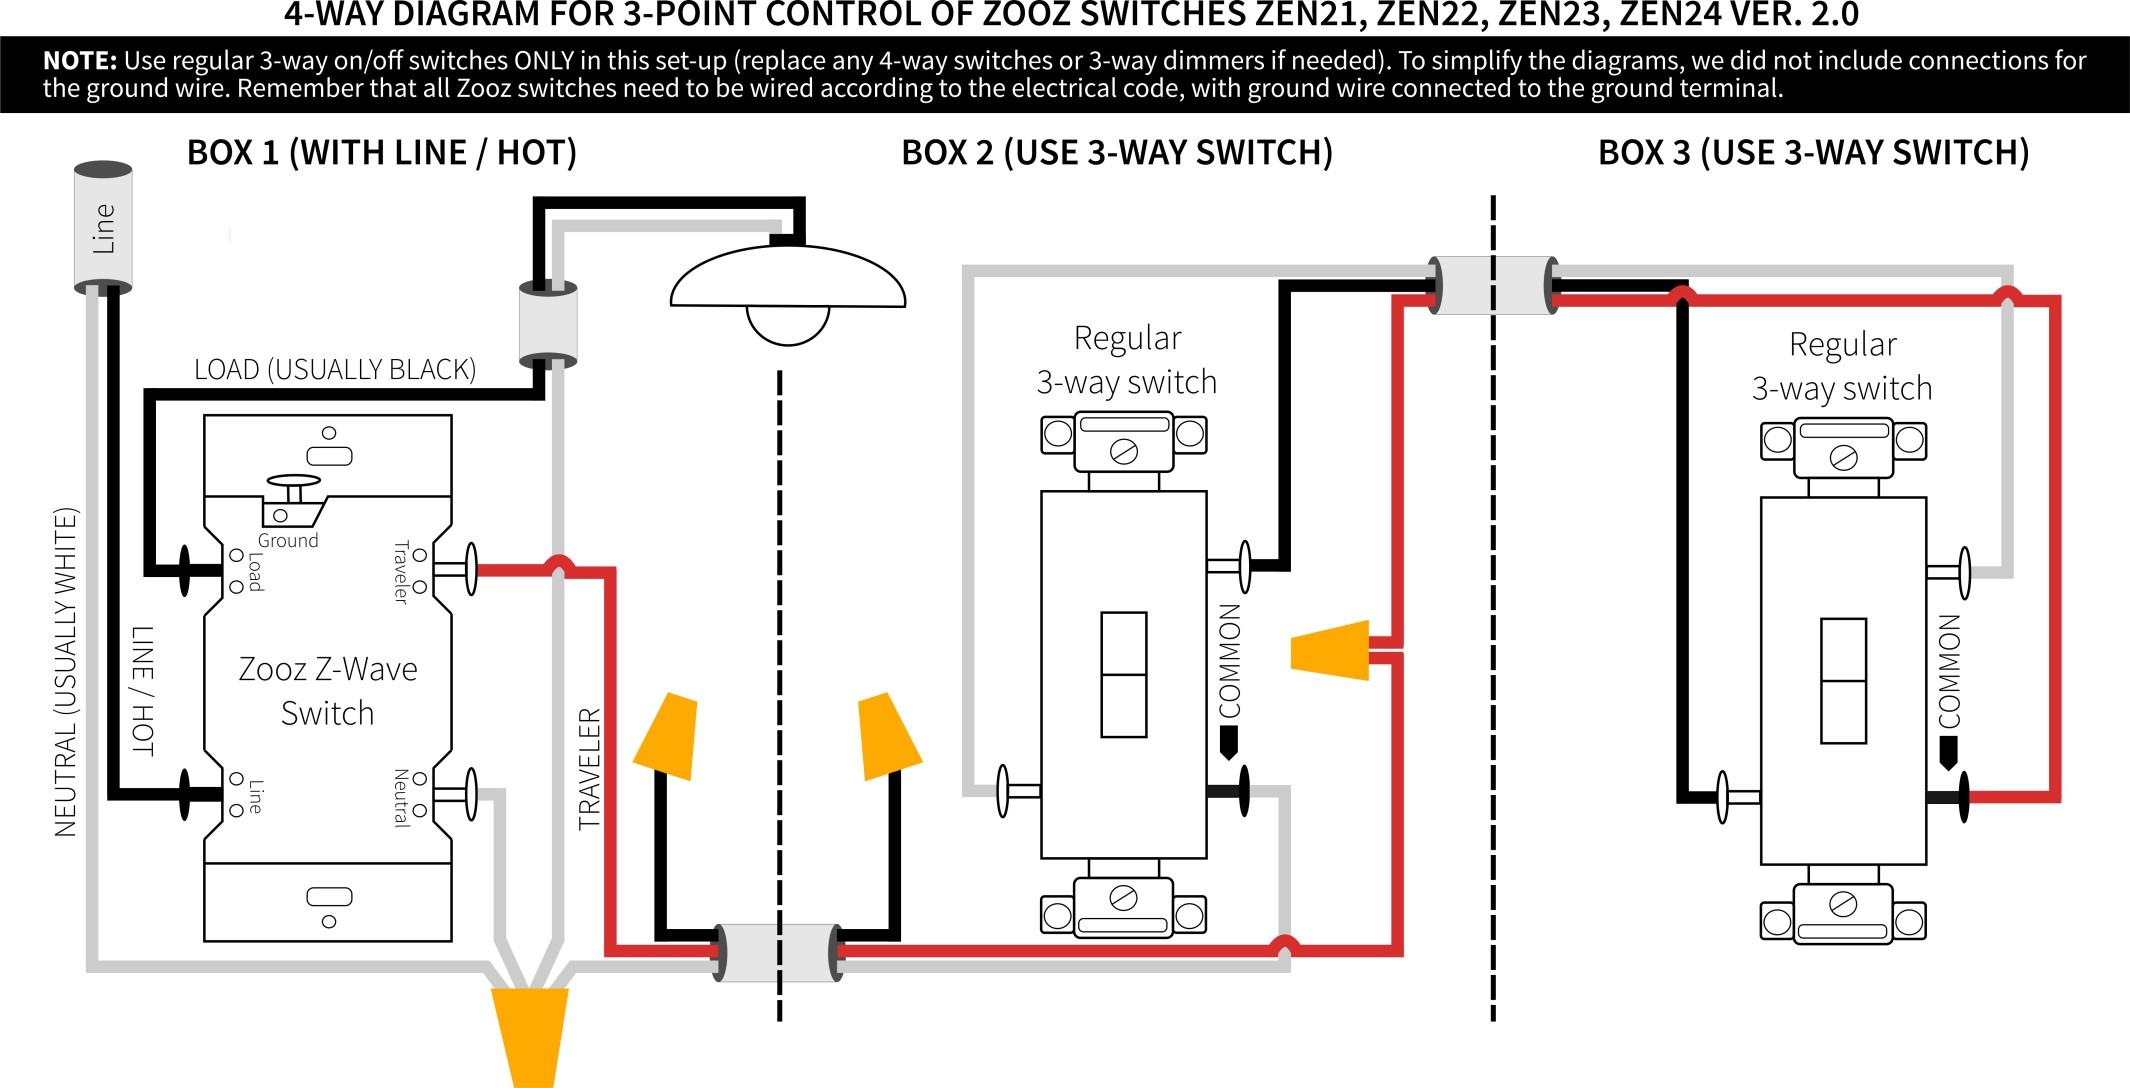 Leviton Decora 3 Way Switch Wiring Diagram 5603 Wiring Diagram 3 Way Smart Switch Wiring Diagram Of Leviton Decora 3 Way Switch Wiring Diagram 5603